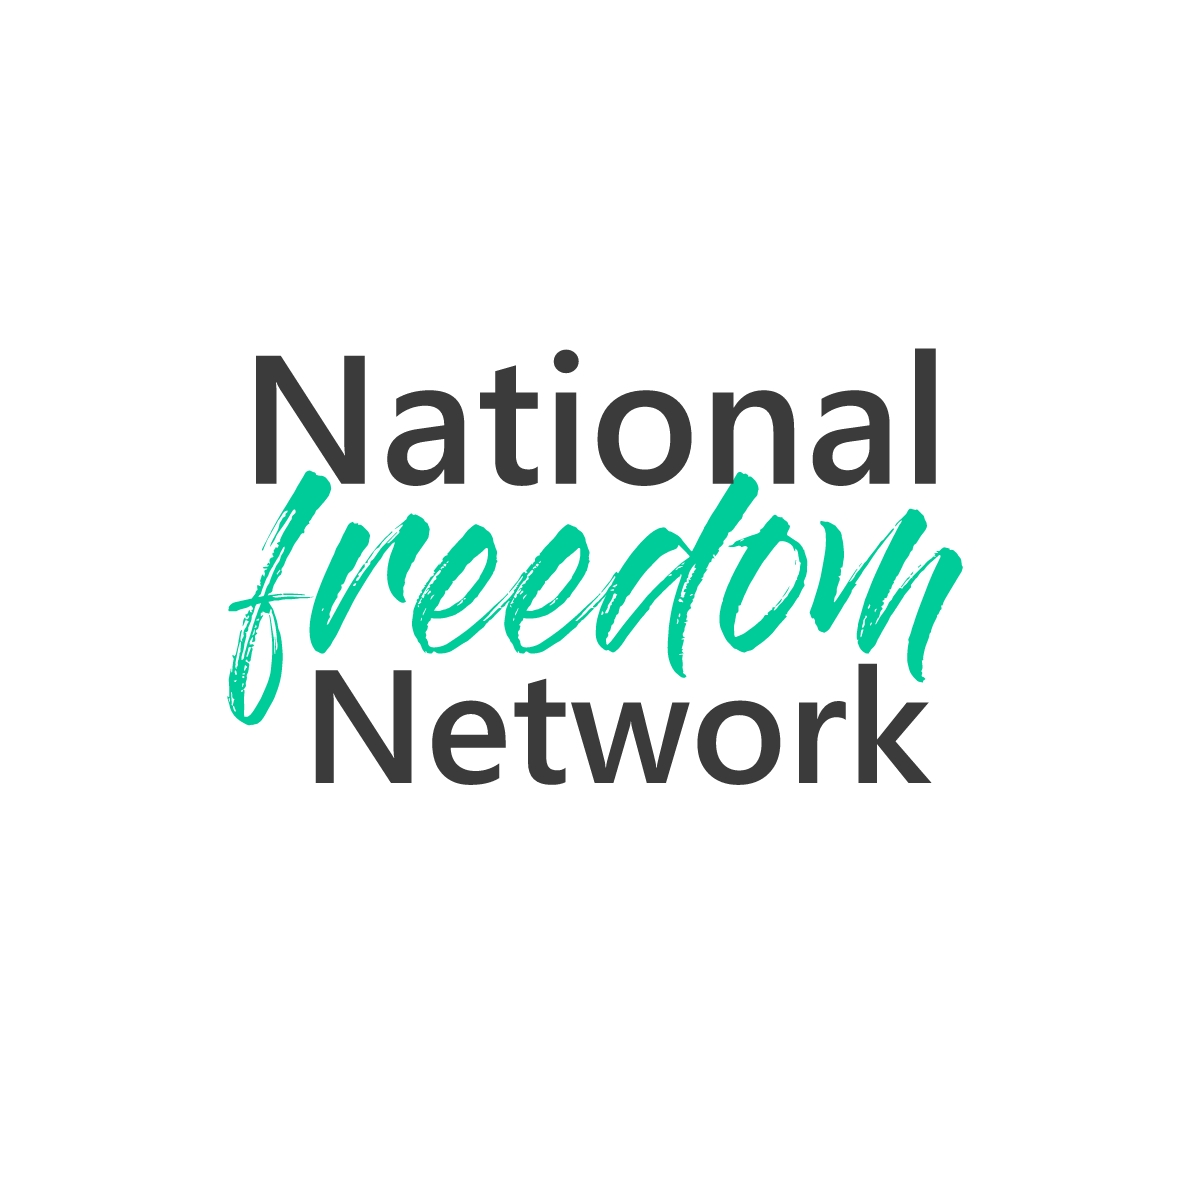 National Freedom Network